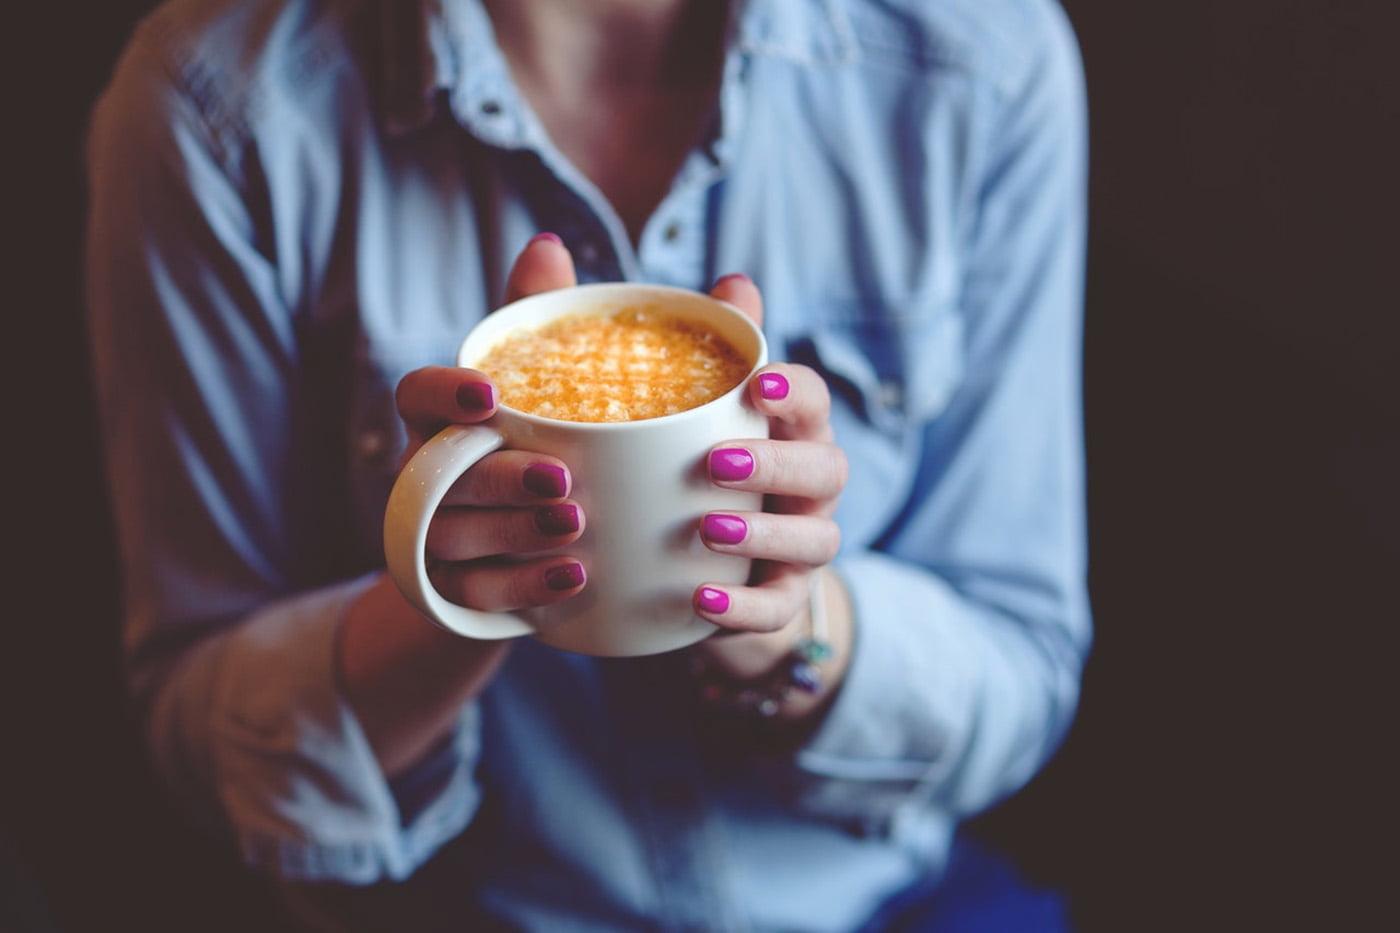 When is Pumpkin Spice Latte Back at Starbucks UK?